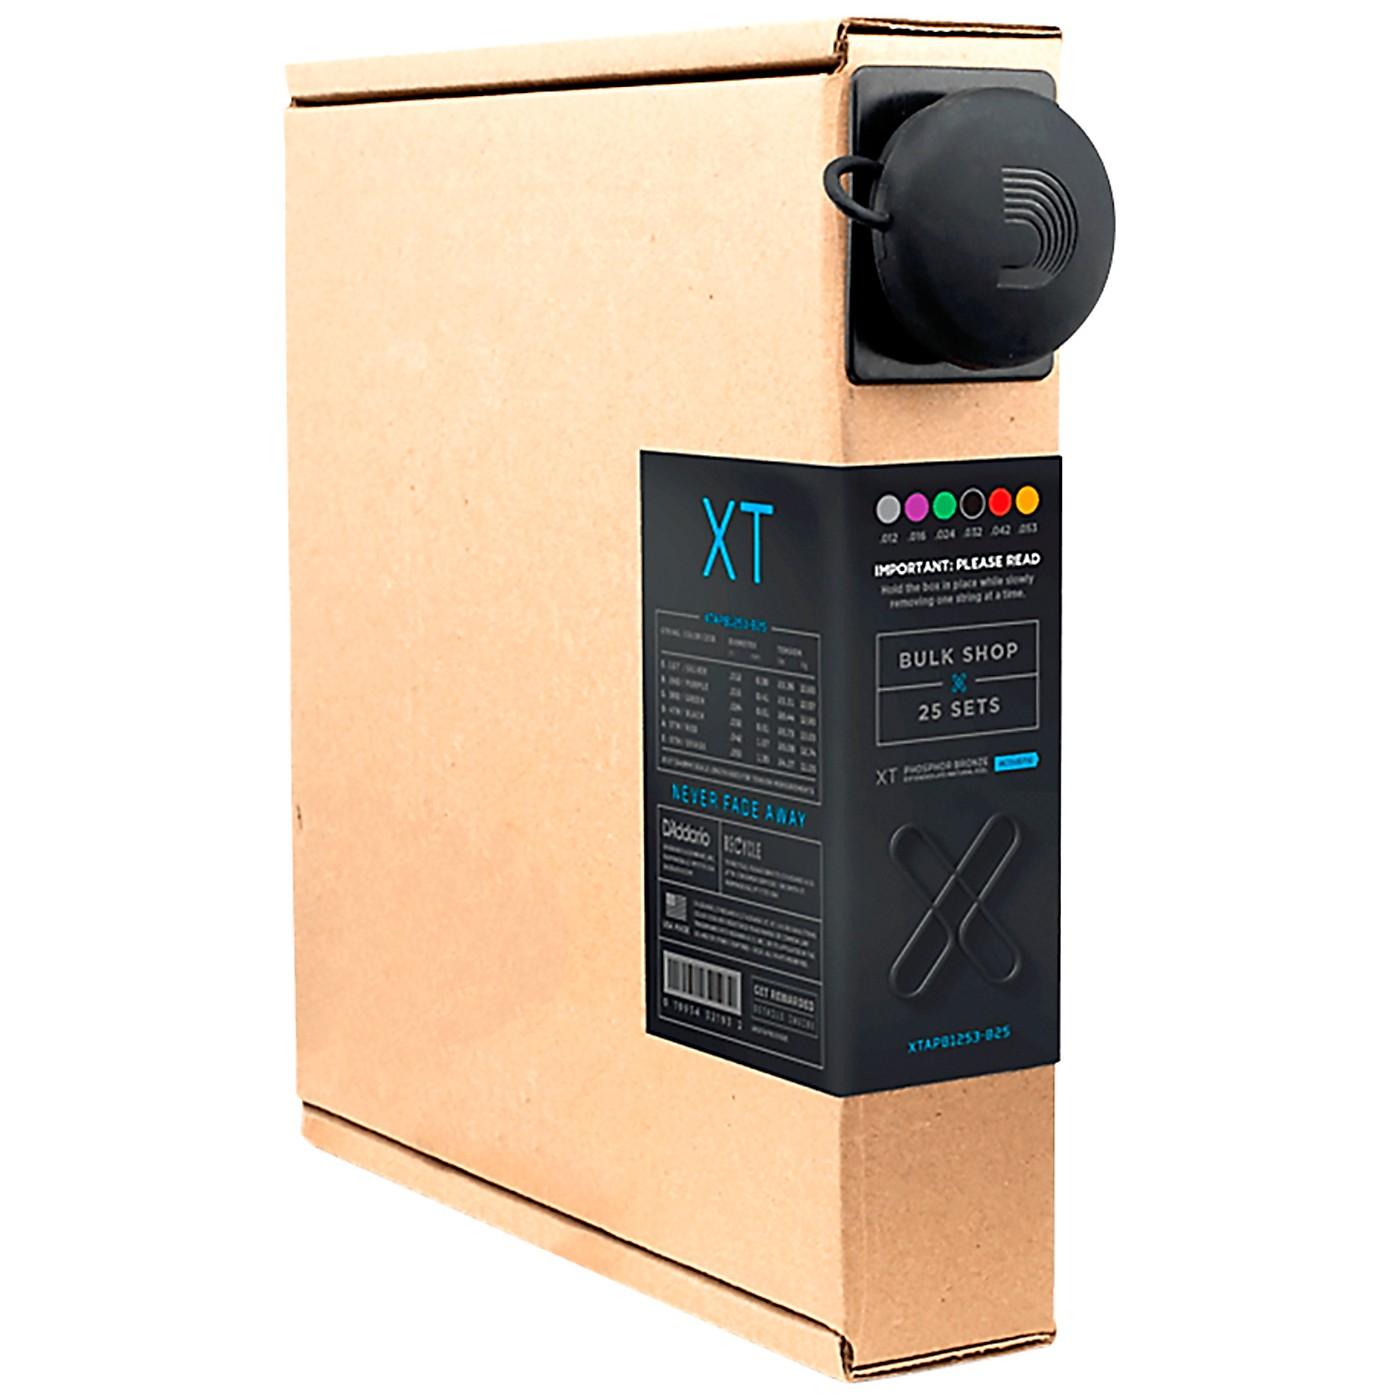 D'Addario XT Acoustic Phosphor Bronze, Light, 12-53, 25 Sets thumbnail